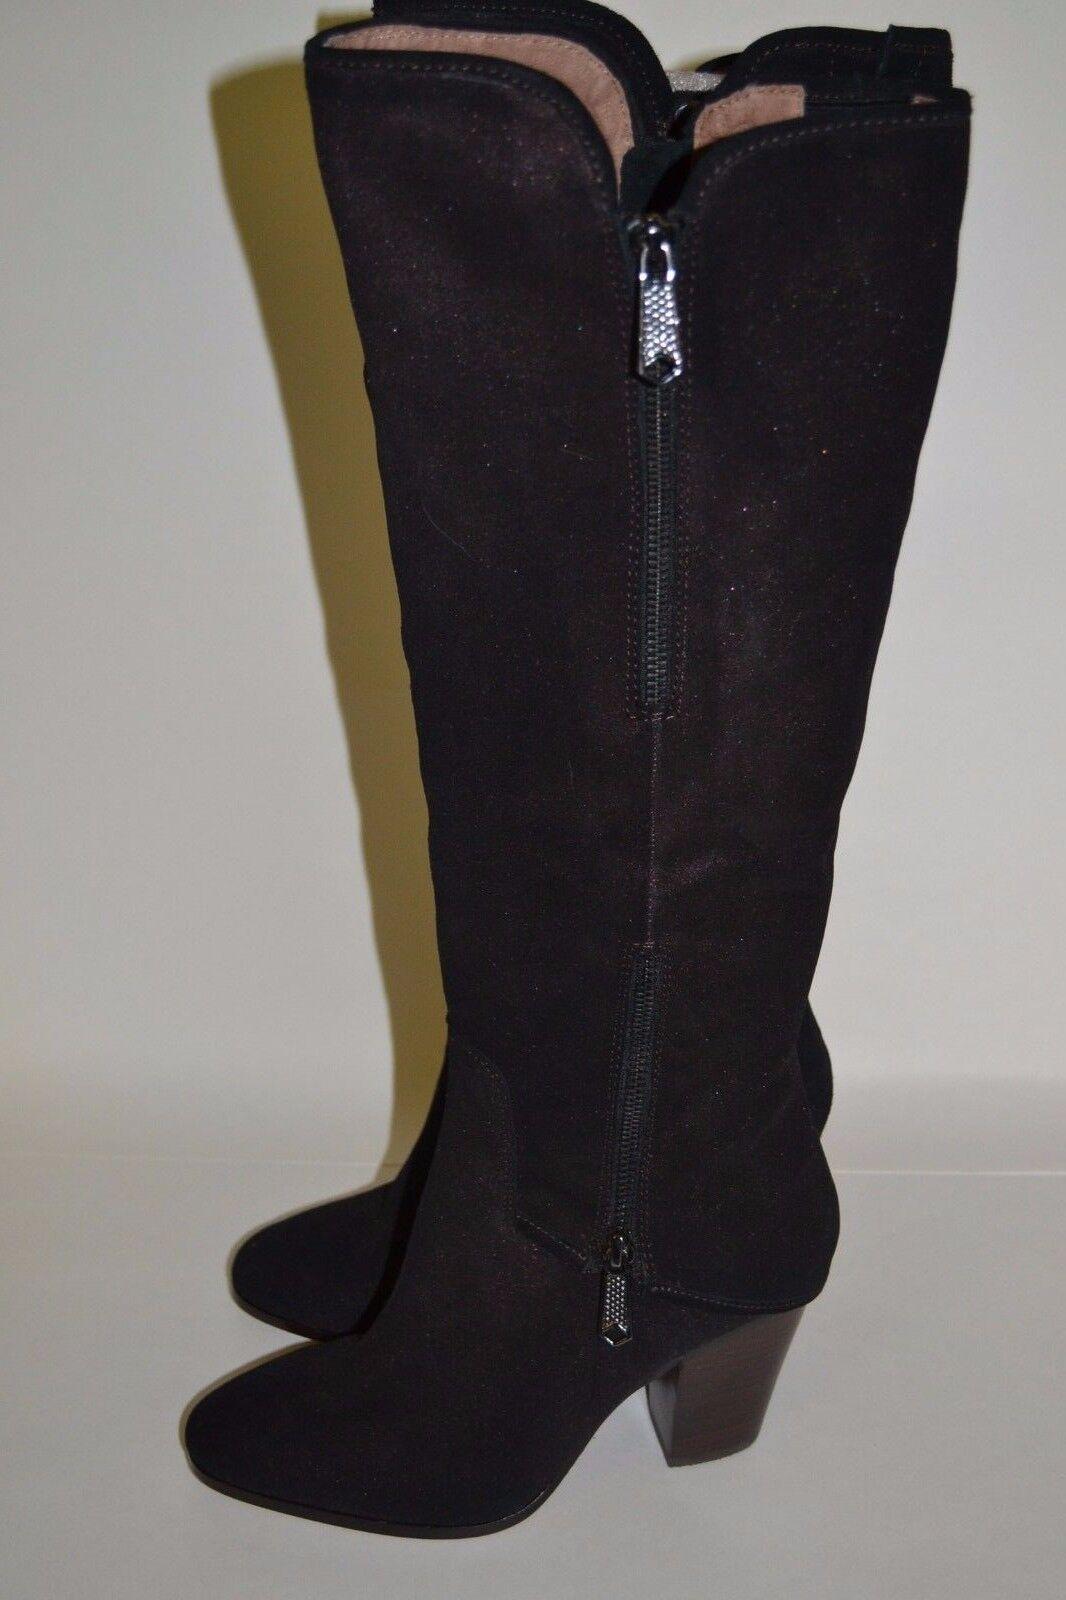 Donald J Pliner SANDORA schwarz W  Bronze Sparkle Suede Stiefel NWOB  398 SZ 7.5